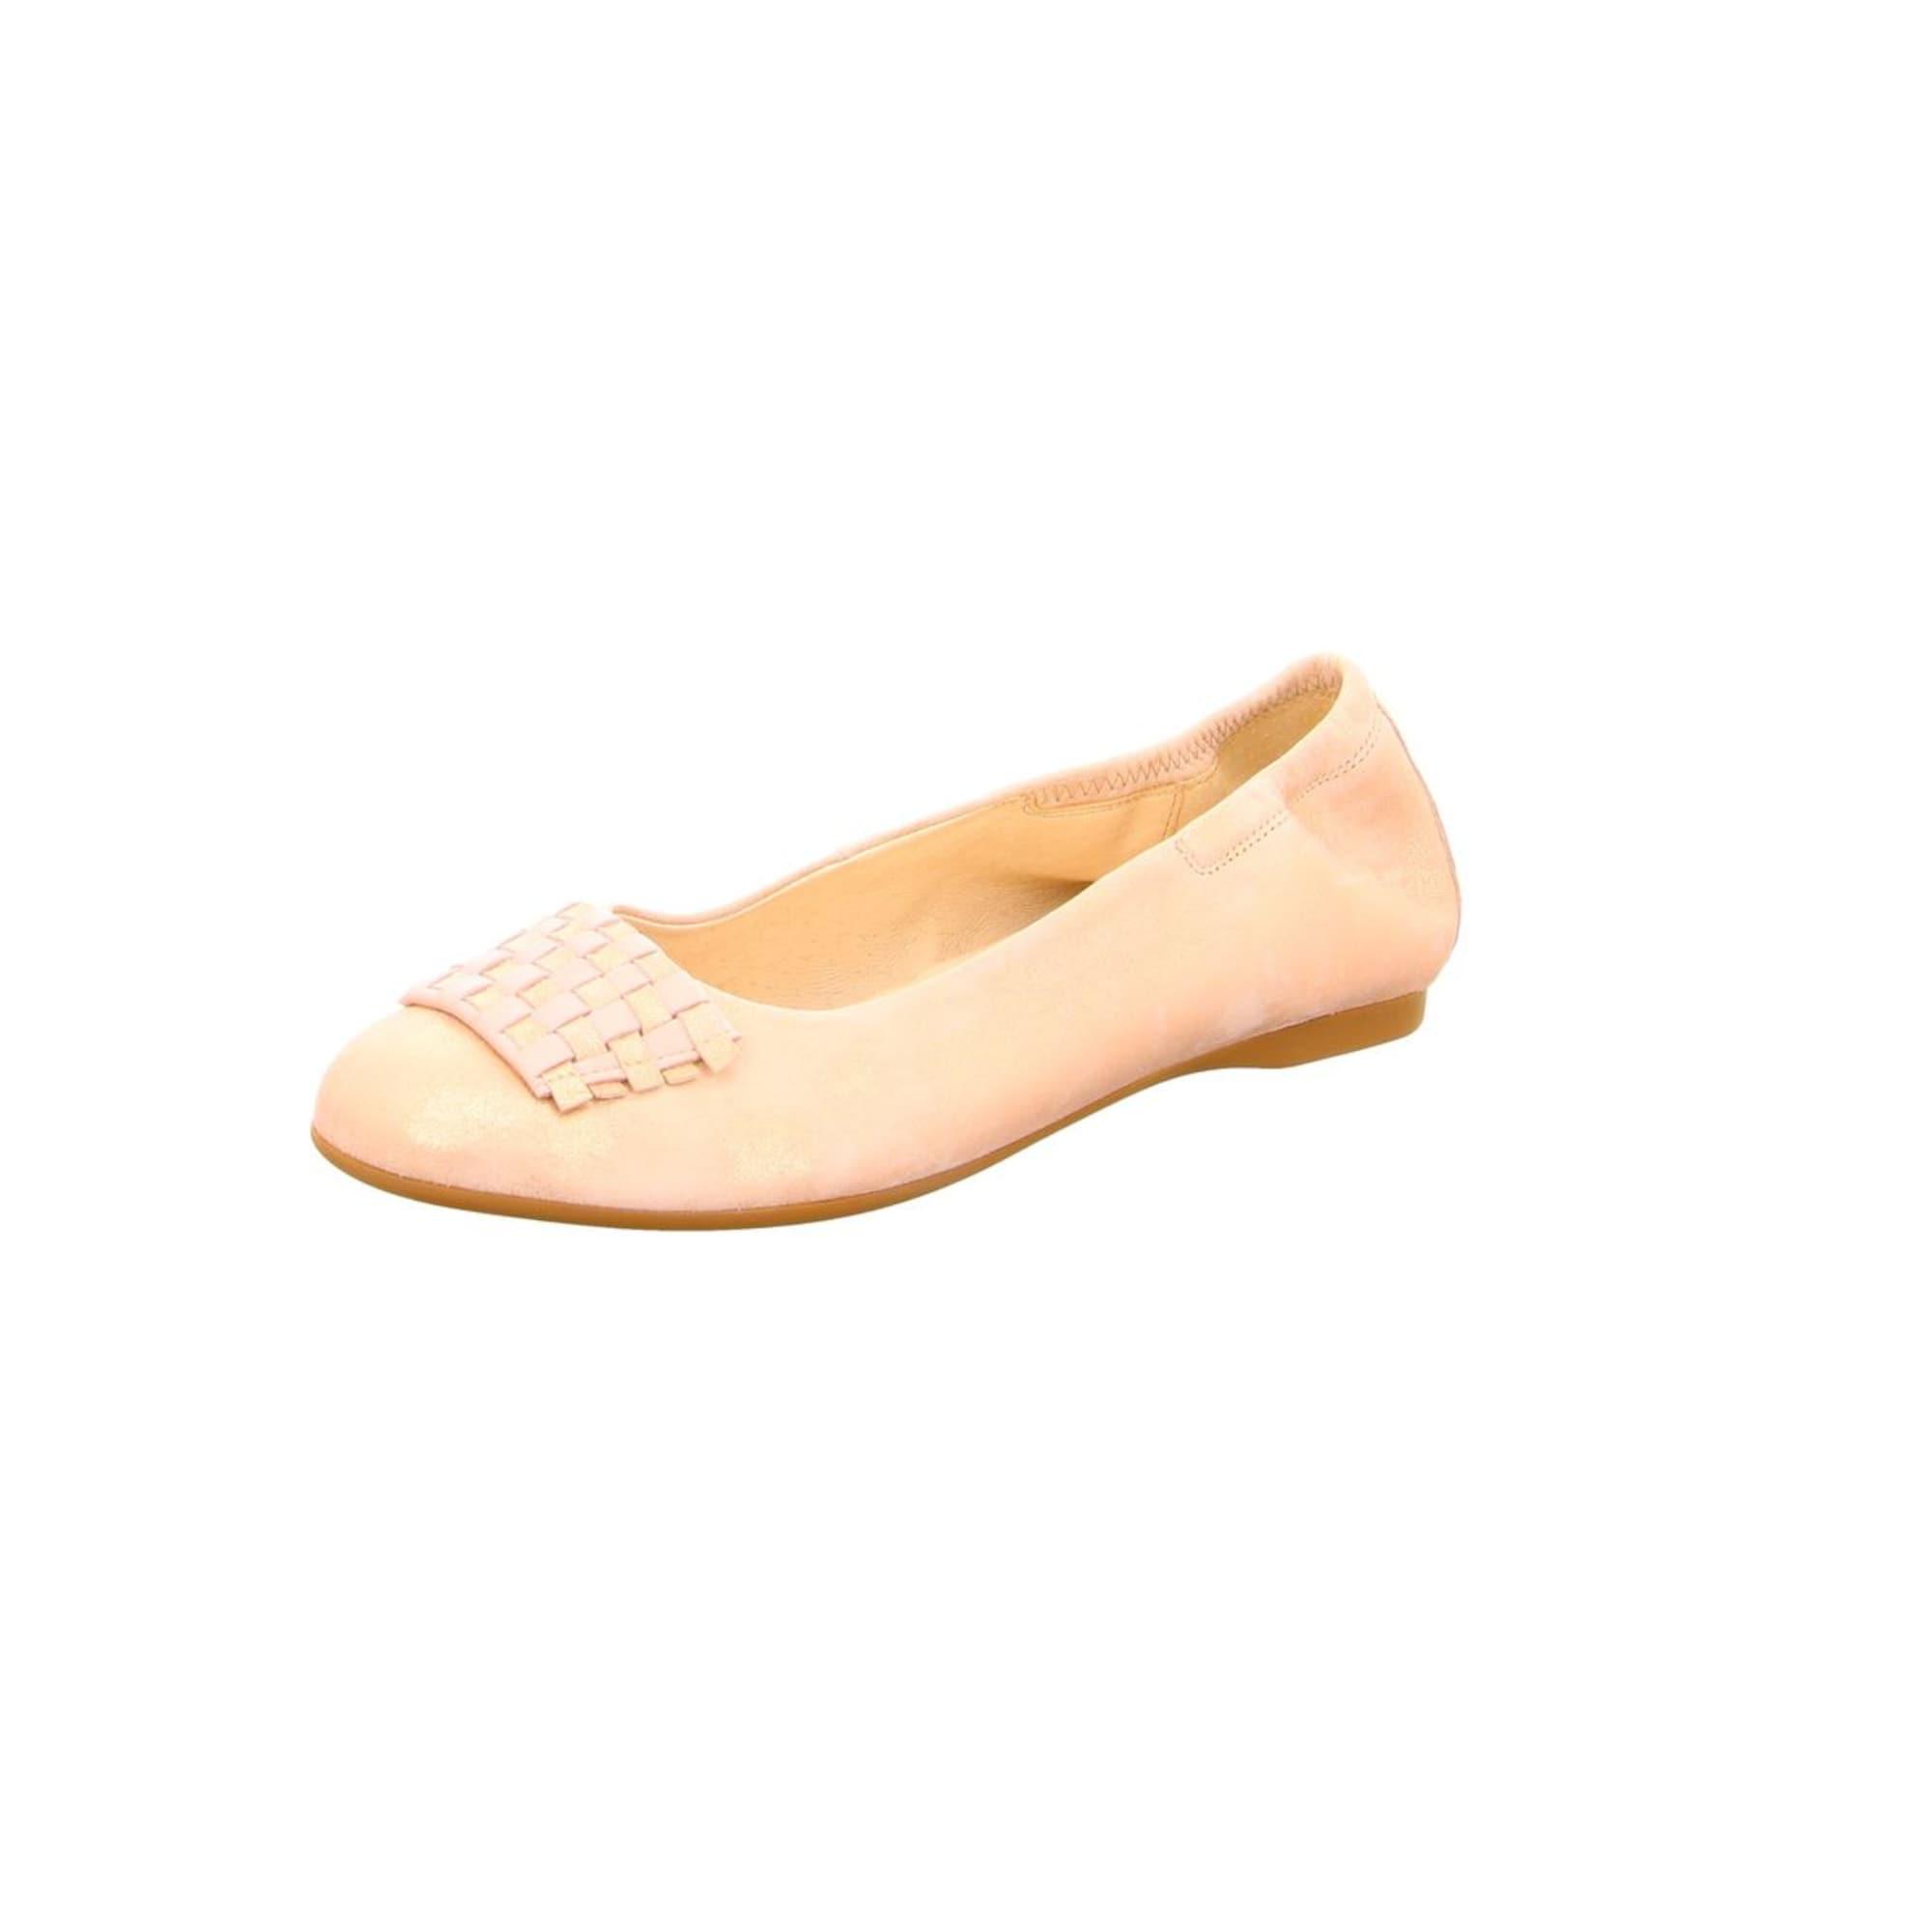 Ballerinas   Schuhe > Ballerinas > Klassische Ballerinas   Rosa   Gabor